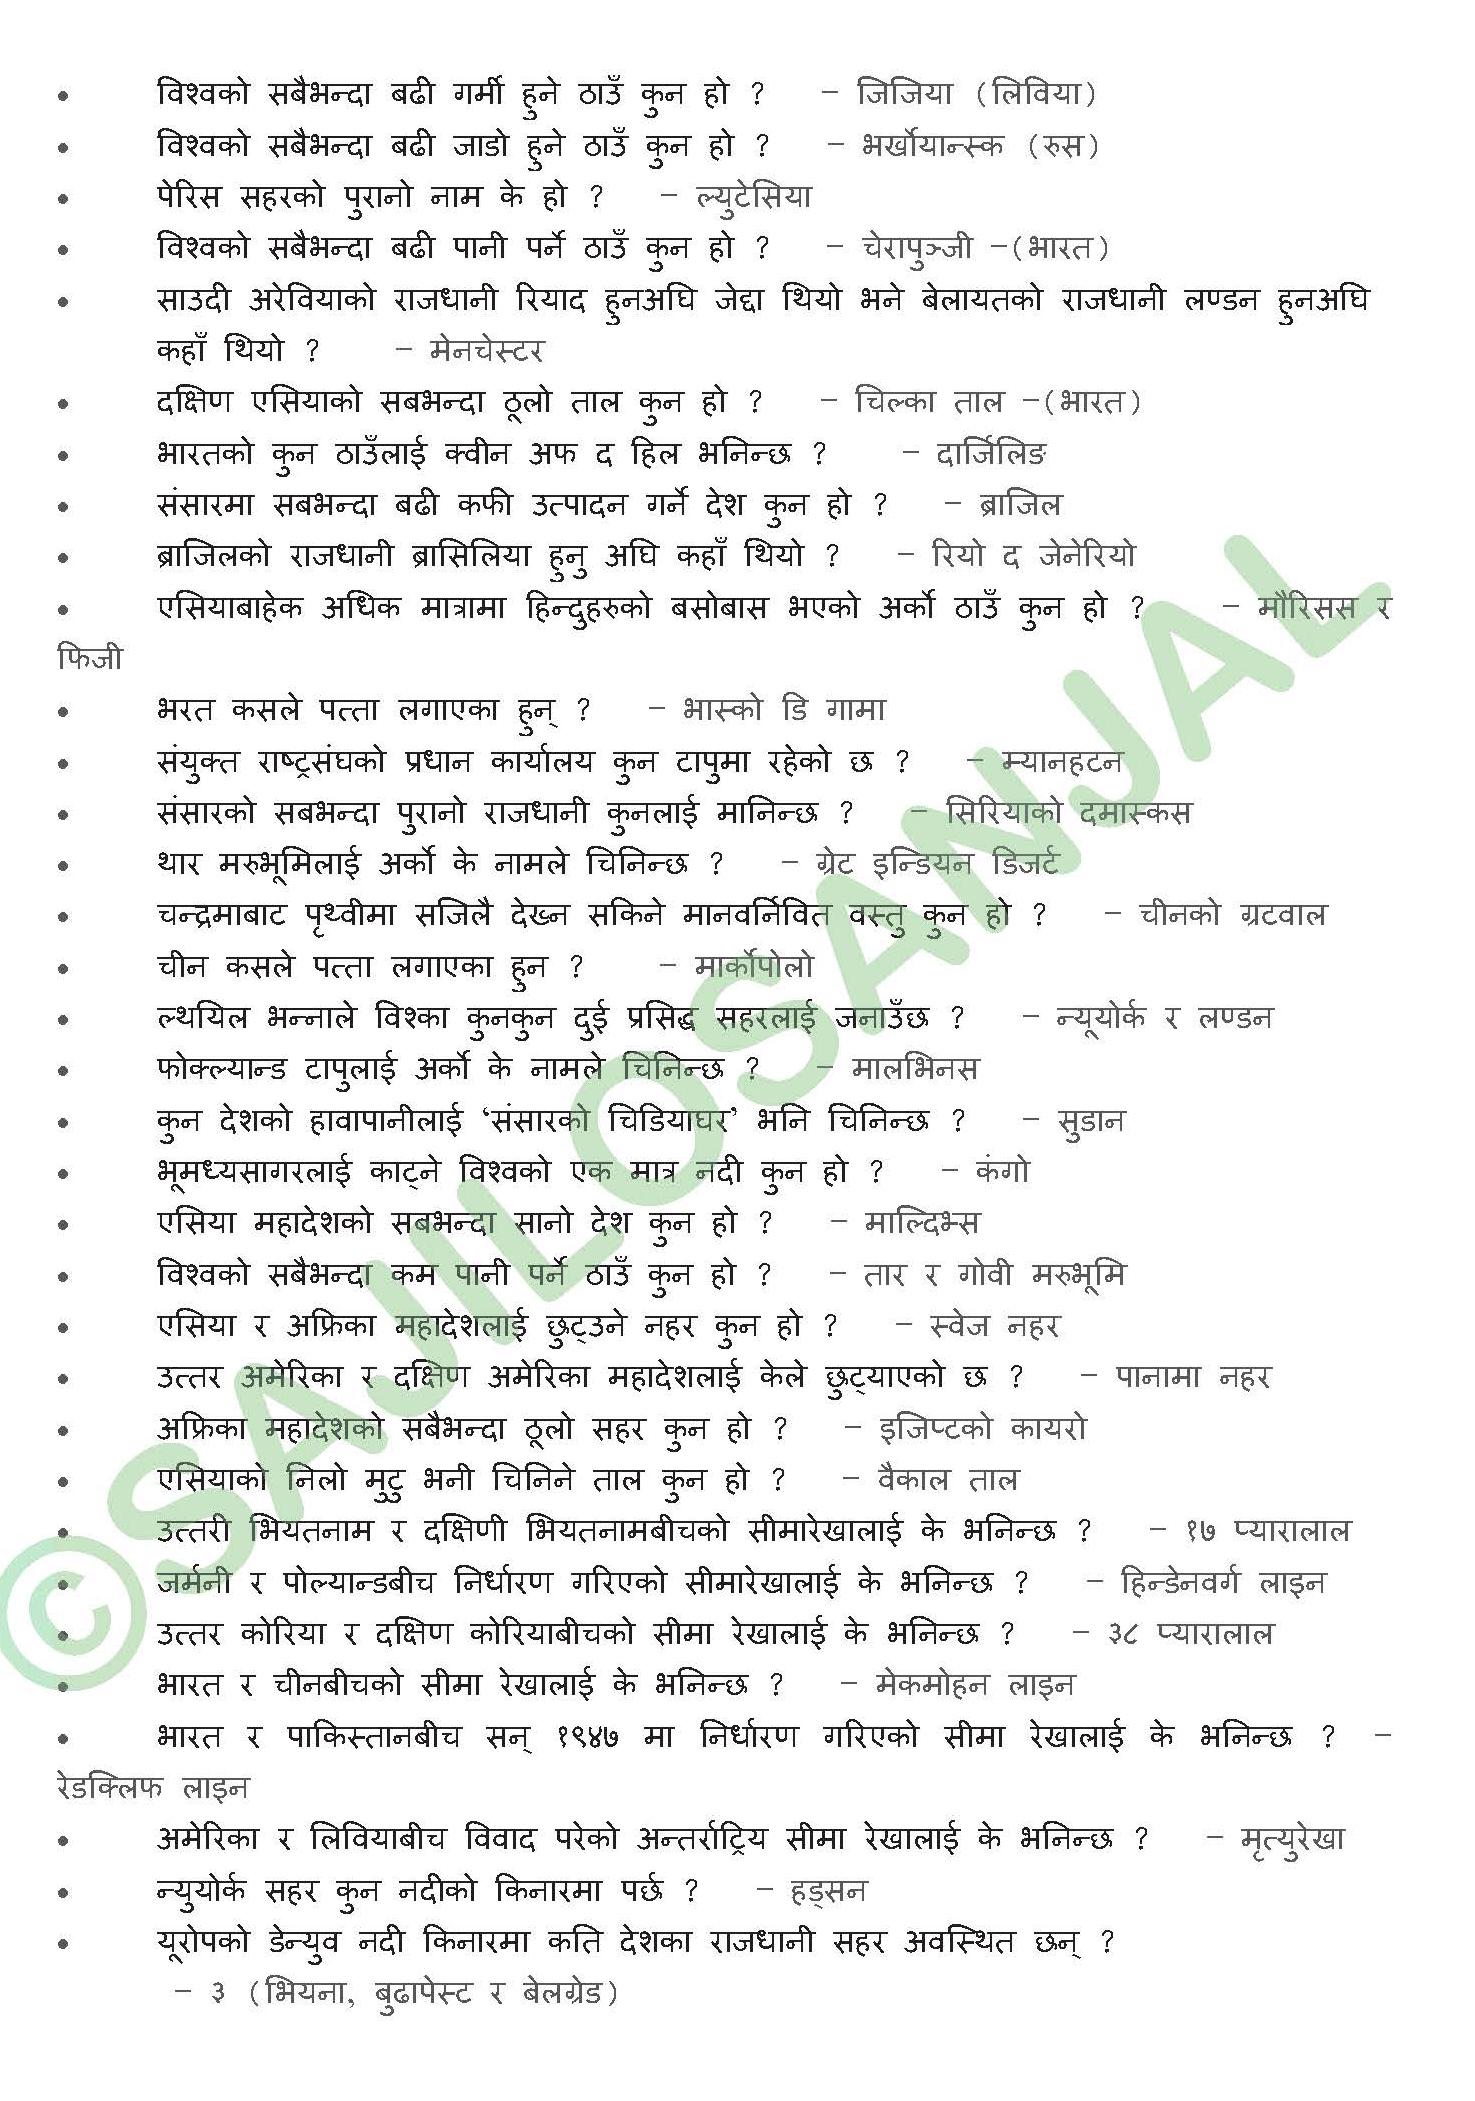 psc.gov.np kharidar question, kharidar question answer 2074, kharidar exam question 2074, loksewa kharidar, haridar model questions, kharidar first paper, kharidar model questions, lok sewa aayog kharidar model questions, lok sewa aayog kharidar, kharidar ko syllabus, kharidar exam, lok sewa aayog kharidar question, kharidar question answer 2075, kharidar question 2074, kharidar question answer, model question of kharidar, kharidar iq, loksewa kharidar question, lok sewa aayog, loksewa, gorkhapatra loksewa, loksewa guide, lok sewa aayog exam, loksewa exam, loksewa quiz, karidar first paper, loksewa news, lok sewa aayog exam 2075 lok sewa aayog exam for kharidar, gorkhapatra loksewa, loksewa gorkhapatra, loksewa exam 2019, loksewa exam 2075, shikshak sewa aayog 2075, loksewa online, lok sewa aayog exam, kharidar second paper, loksewa tricks, loksewa iq, lok sewa aayog 2074 online loksewa, lok sewa guide, kharidar question 2074, lok sewa preparation class, kharidar question 2074, lok sewa aayog exam, खरीदार, लोक सेवा आयोग, लोक सेवा आयोग नेपाल, lok sewa aayog question, lok sewa aayog question 2075, lok sewa aayog,